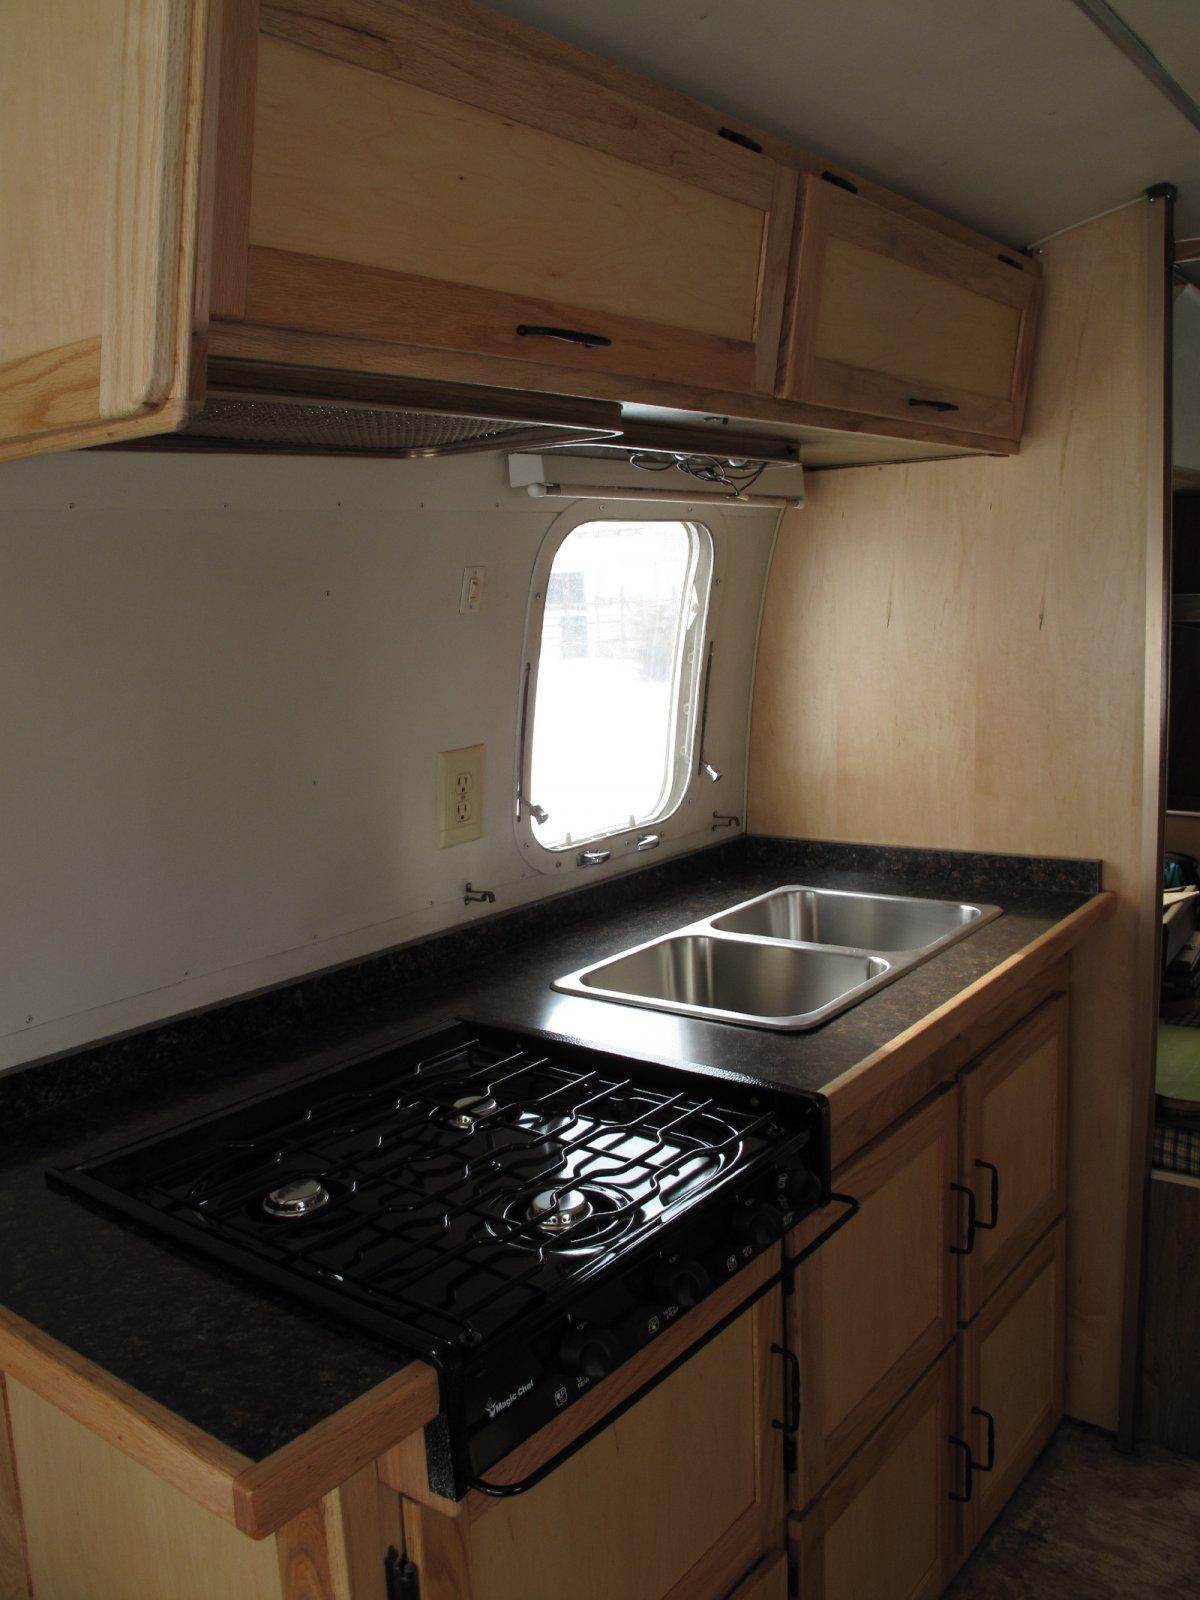 Click image for larger version  Name:Upper sink cabinet 2.jpg Views:89 Size:190.3 KB ID:95581